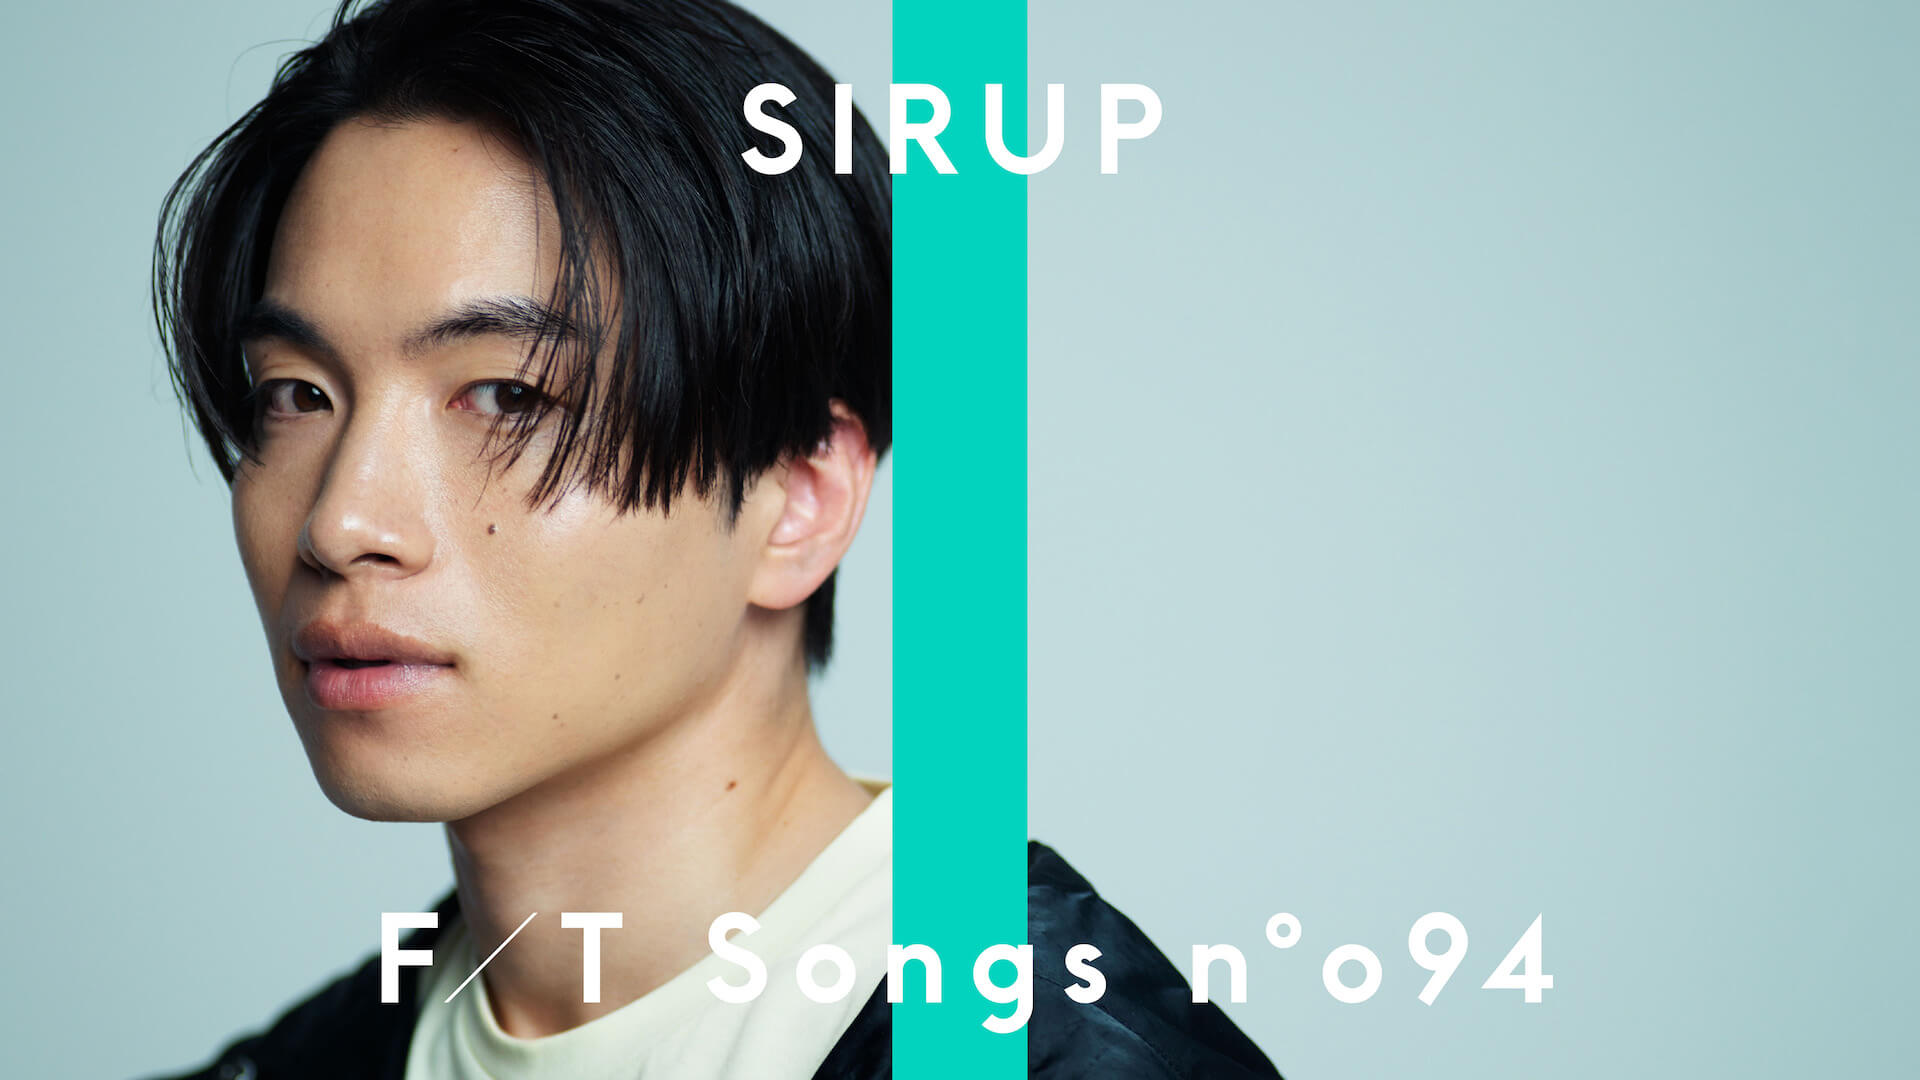 "SIRUPがTHE FIRST TAKEについに登場!MVの再生回数が2000万回を超える""LOOP""のピアノアレンジを一発撮り music210219_sirup_thefirsttake_2"